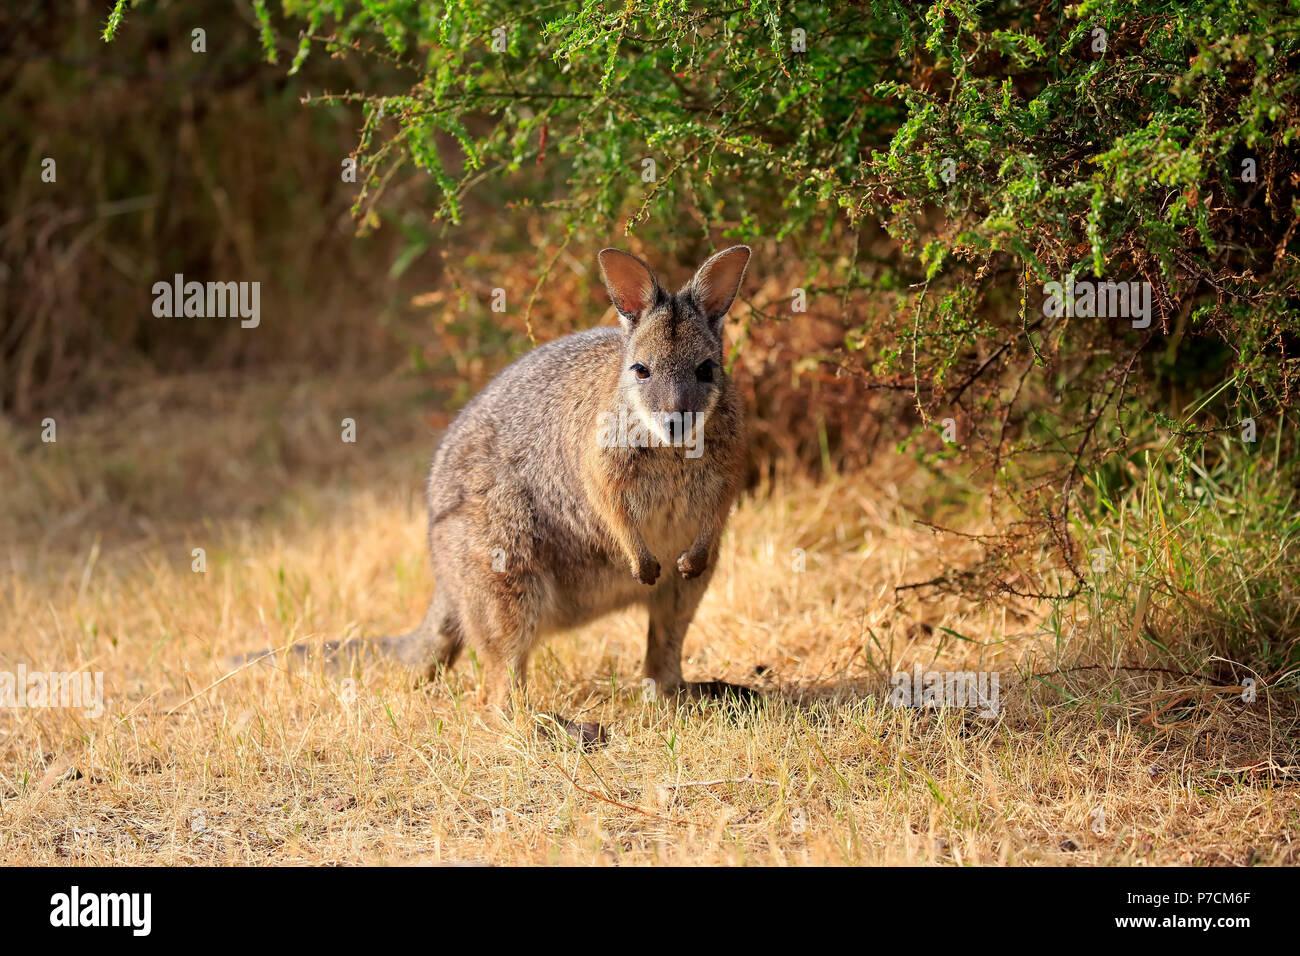 Tammar Wallaby, Dama-Wallaby, adult, Kangaroo Island, South Australia, Australia, (Macropus eugenii) - Stock Image